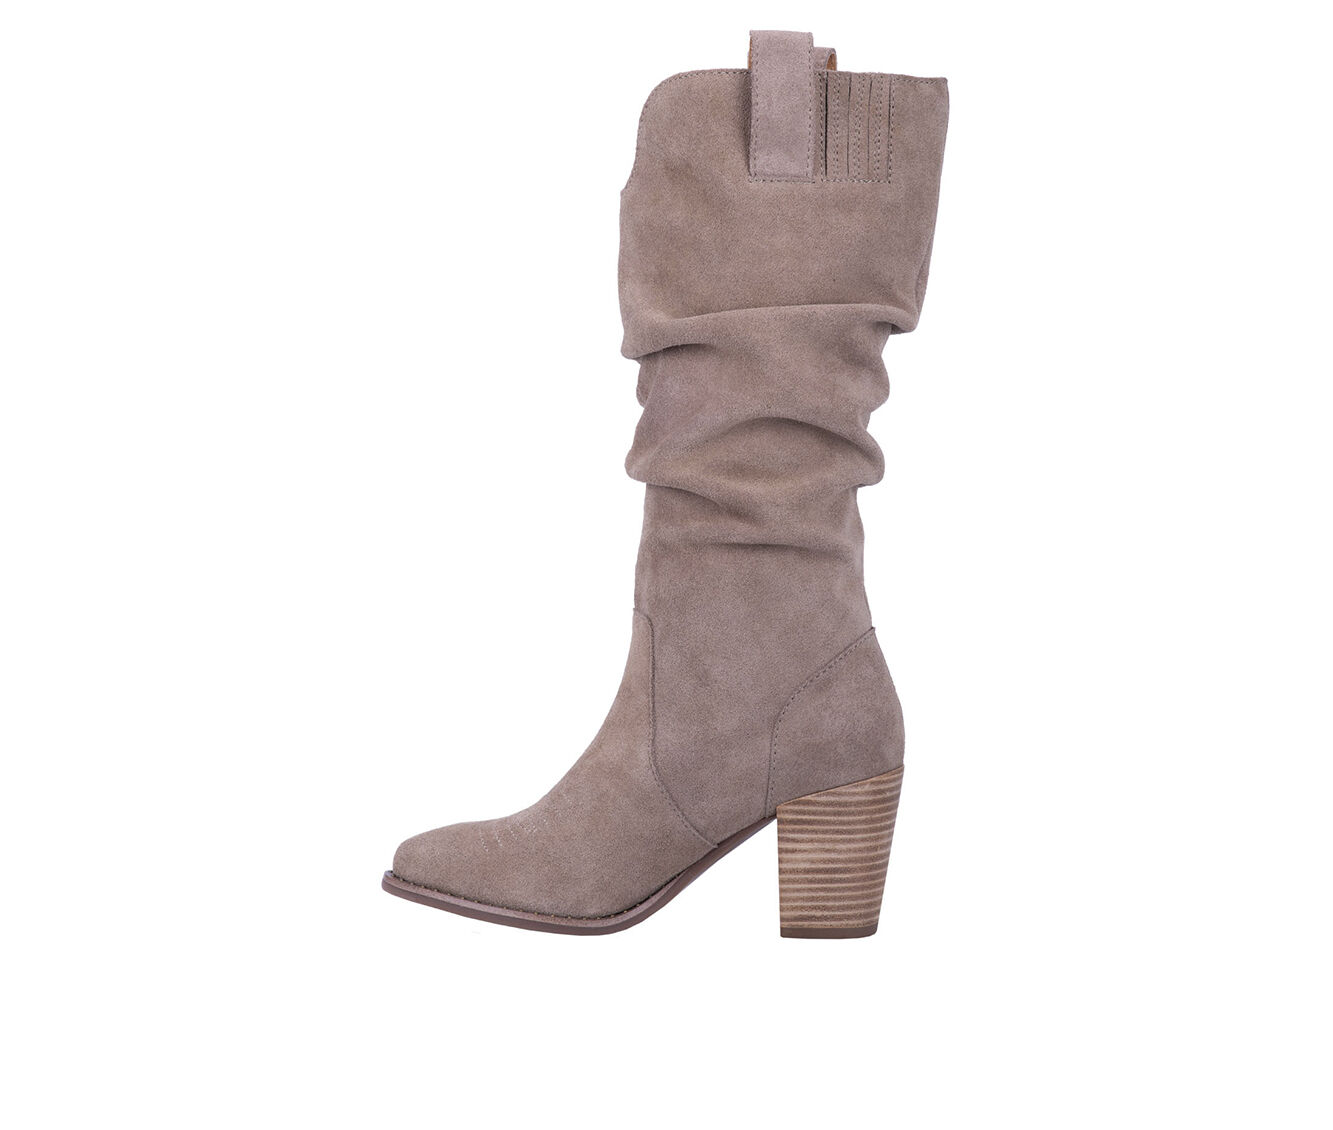 Women's Dingo Boot Cantina Western Knee High Boots   Women's shoes   2020 New eimq0